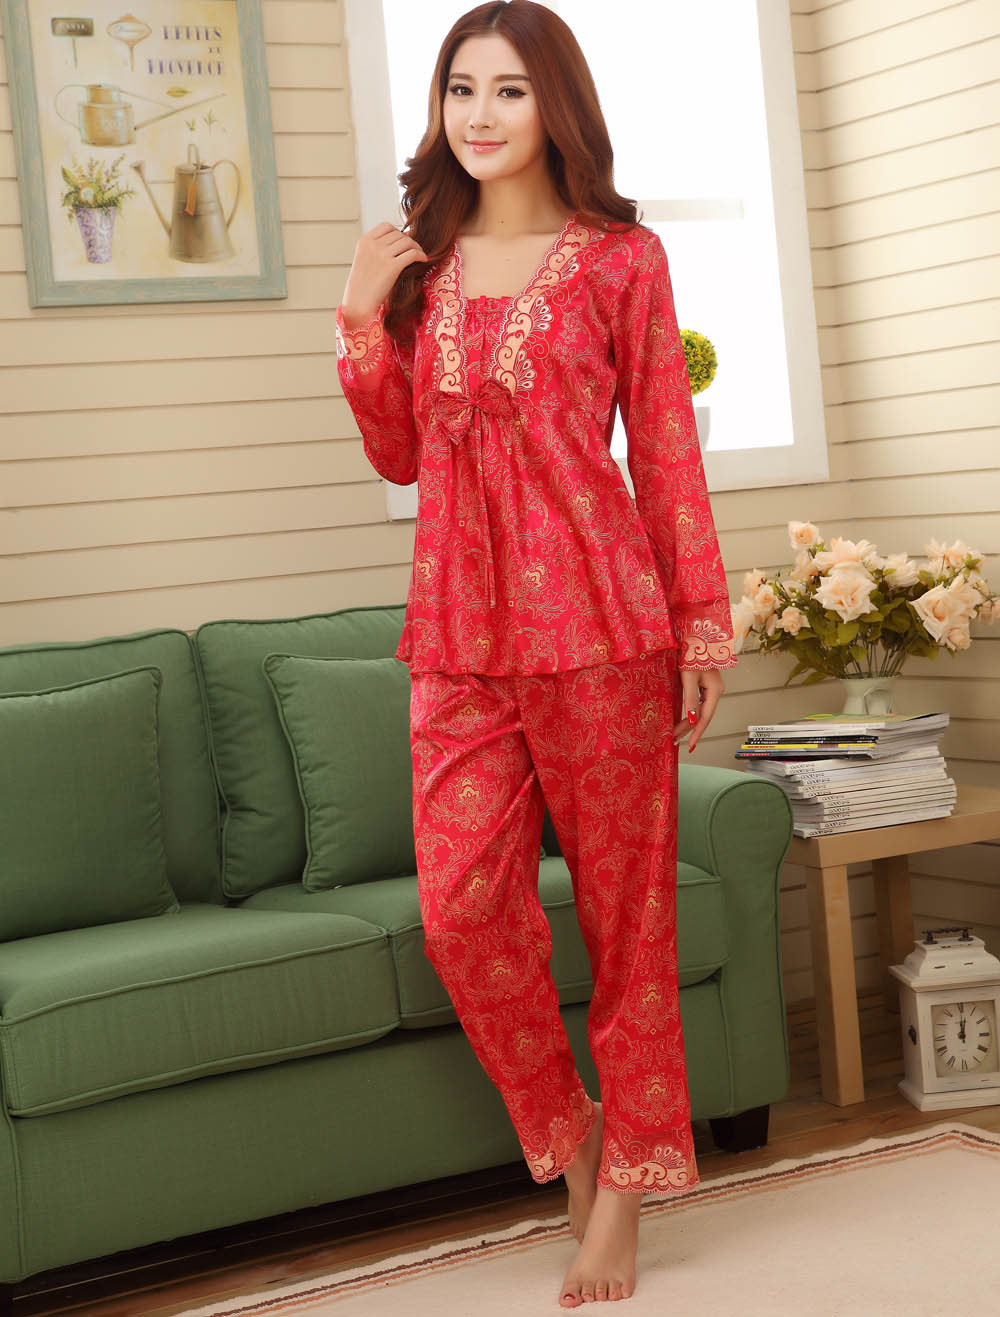 dd890f1cd5055f Faux seda Conjuntos de Pijama Casal para homens mulheres feminino casamento  casamento nightgowns pijamas homewear salão masculino pijama nightwears -  ...